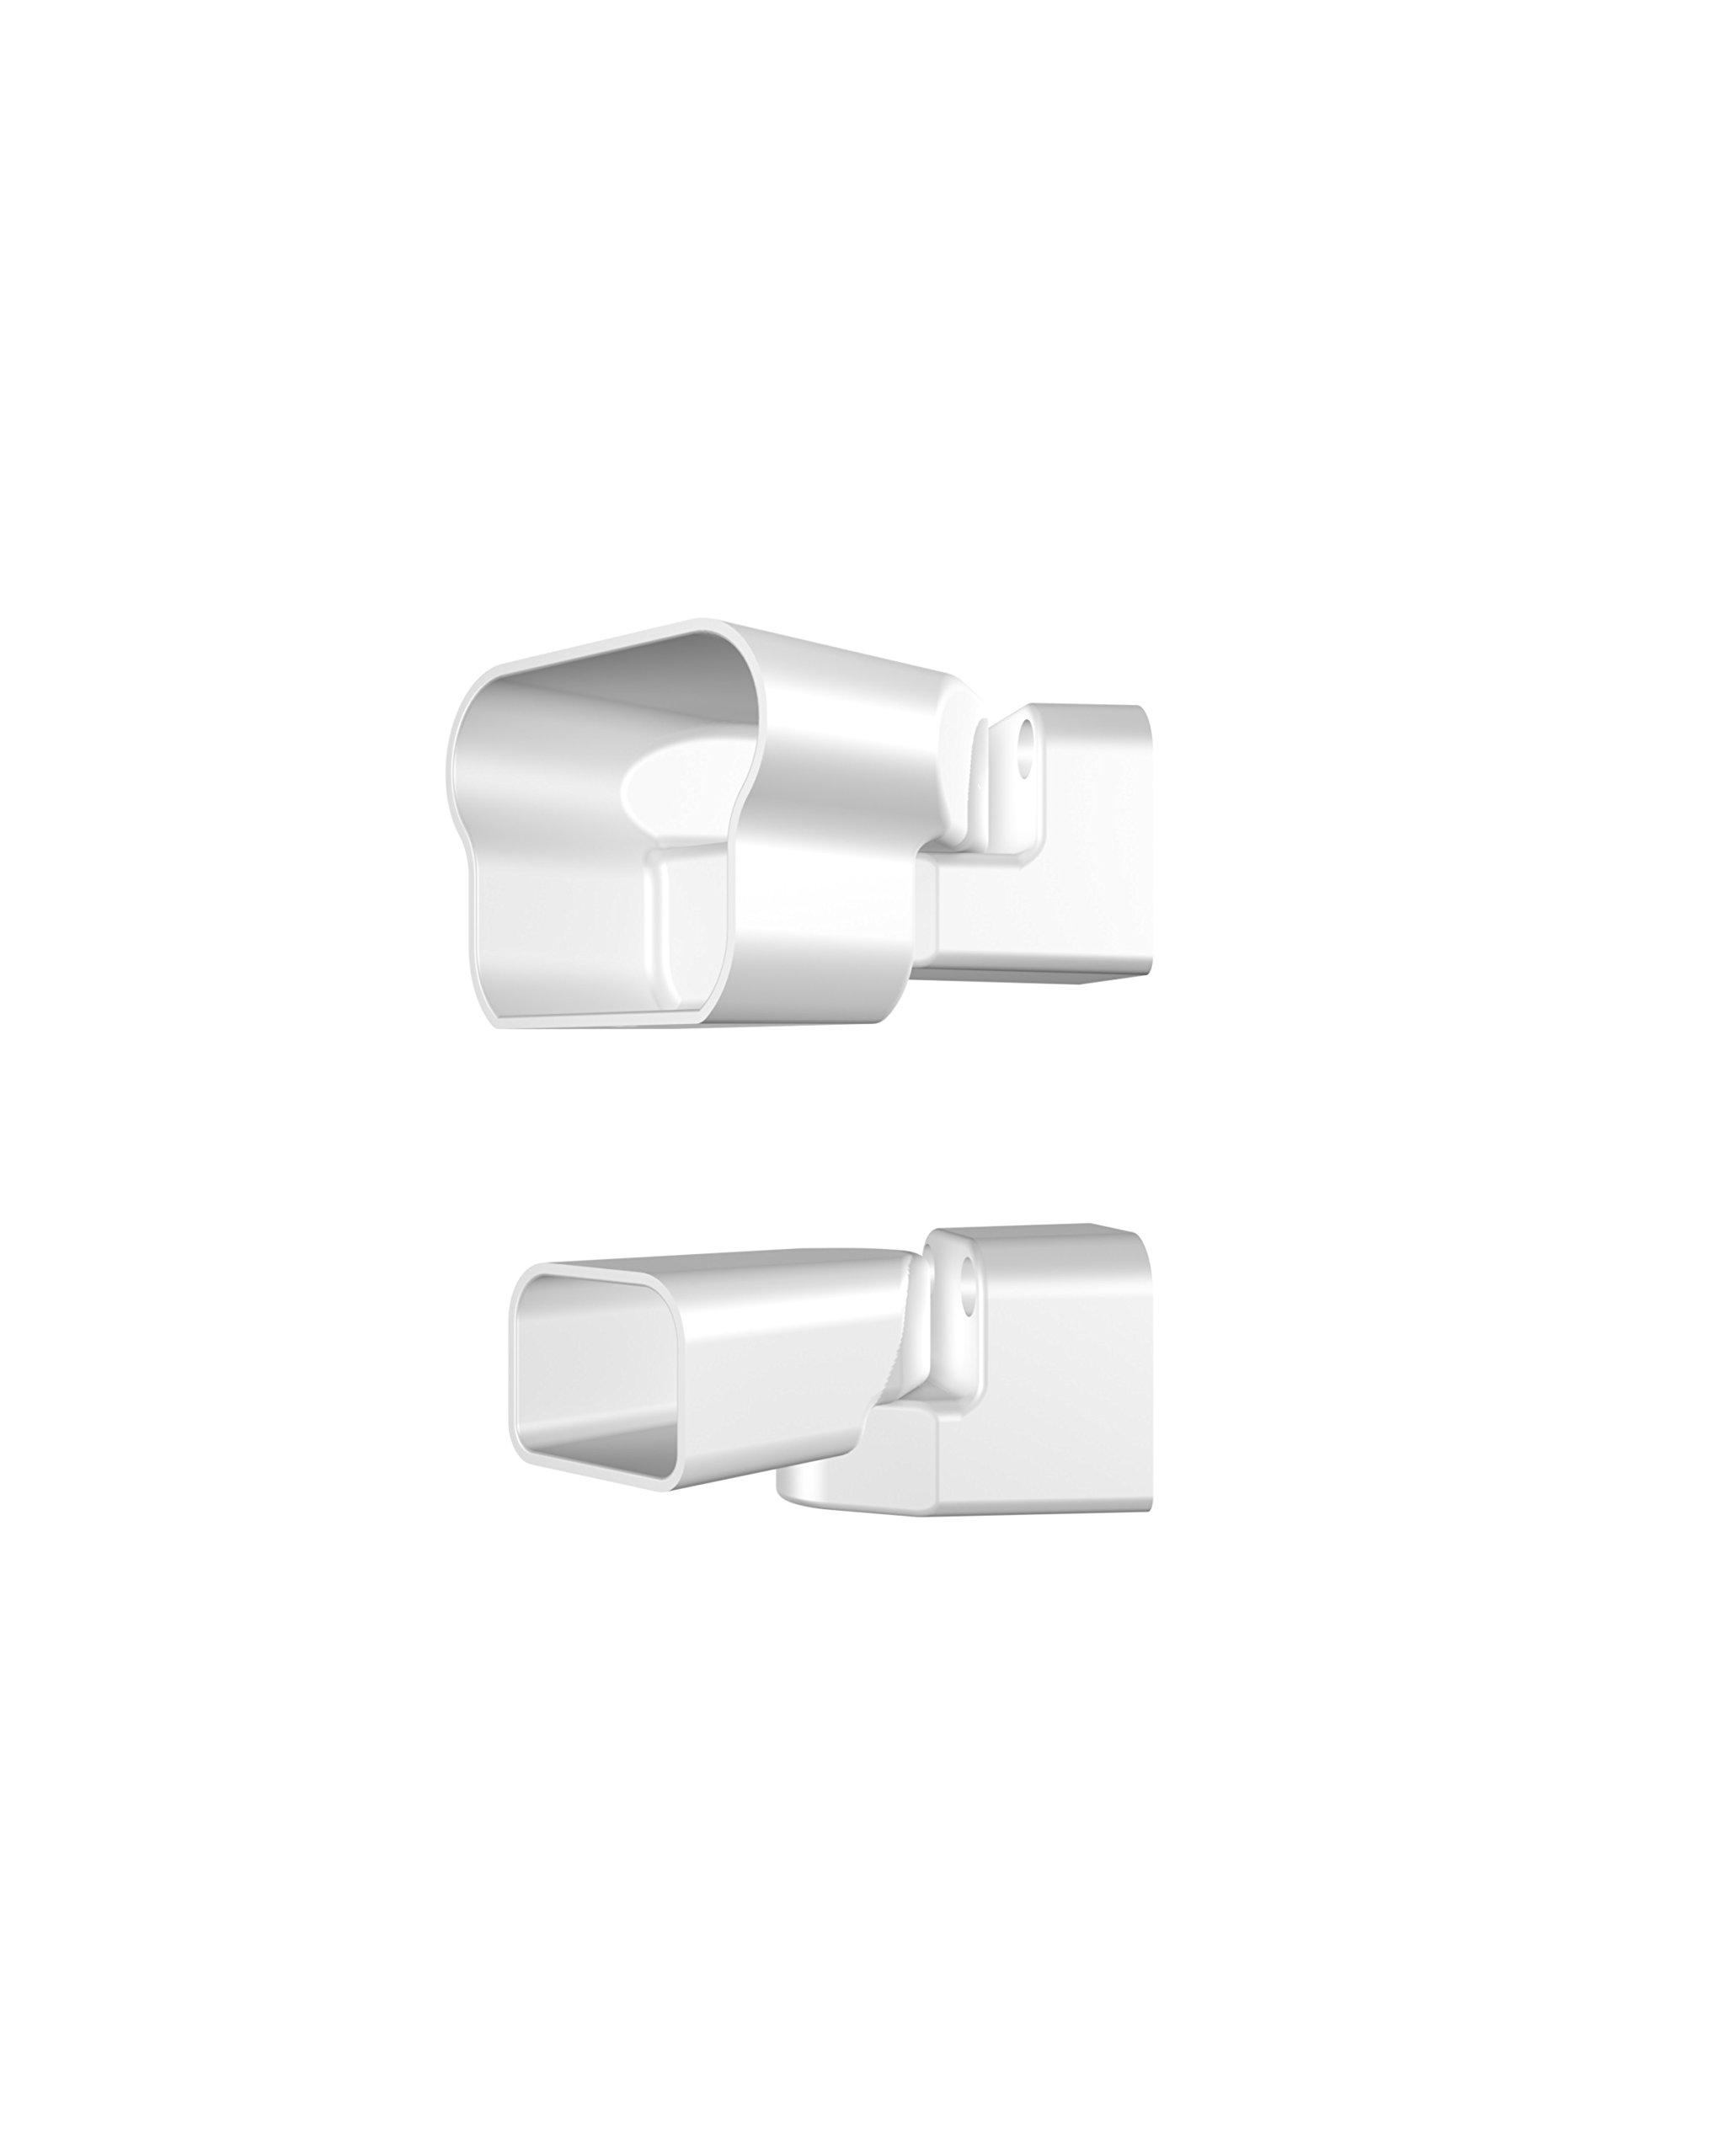 Ultimate Multi-Angle Bracket Kit - White Fine Textured